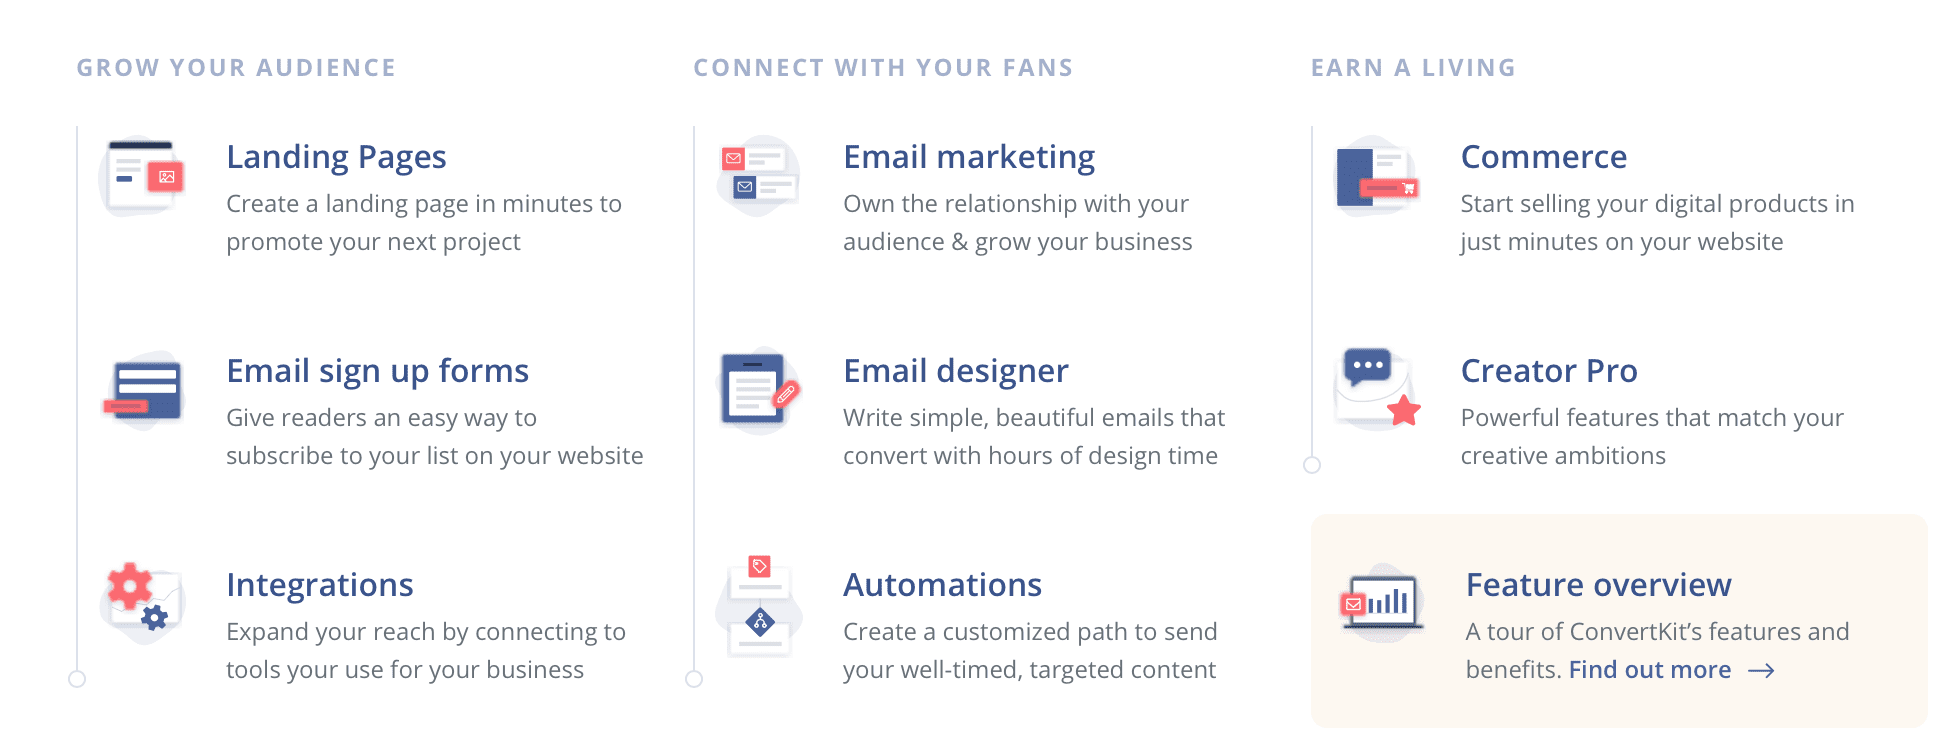 ConvertKit's features